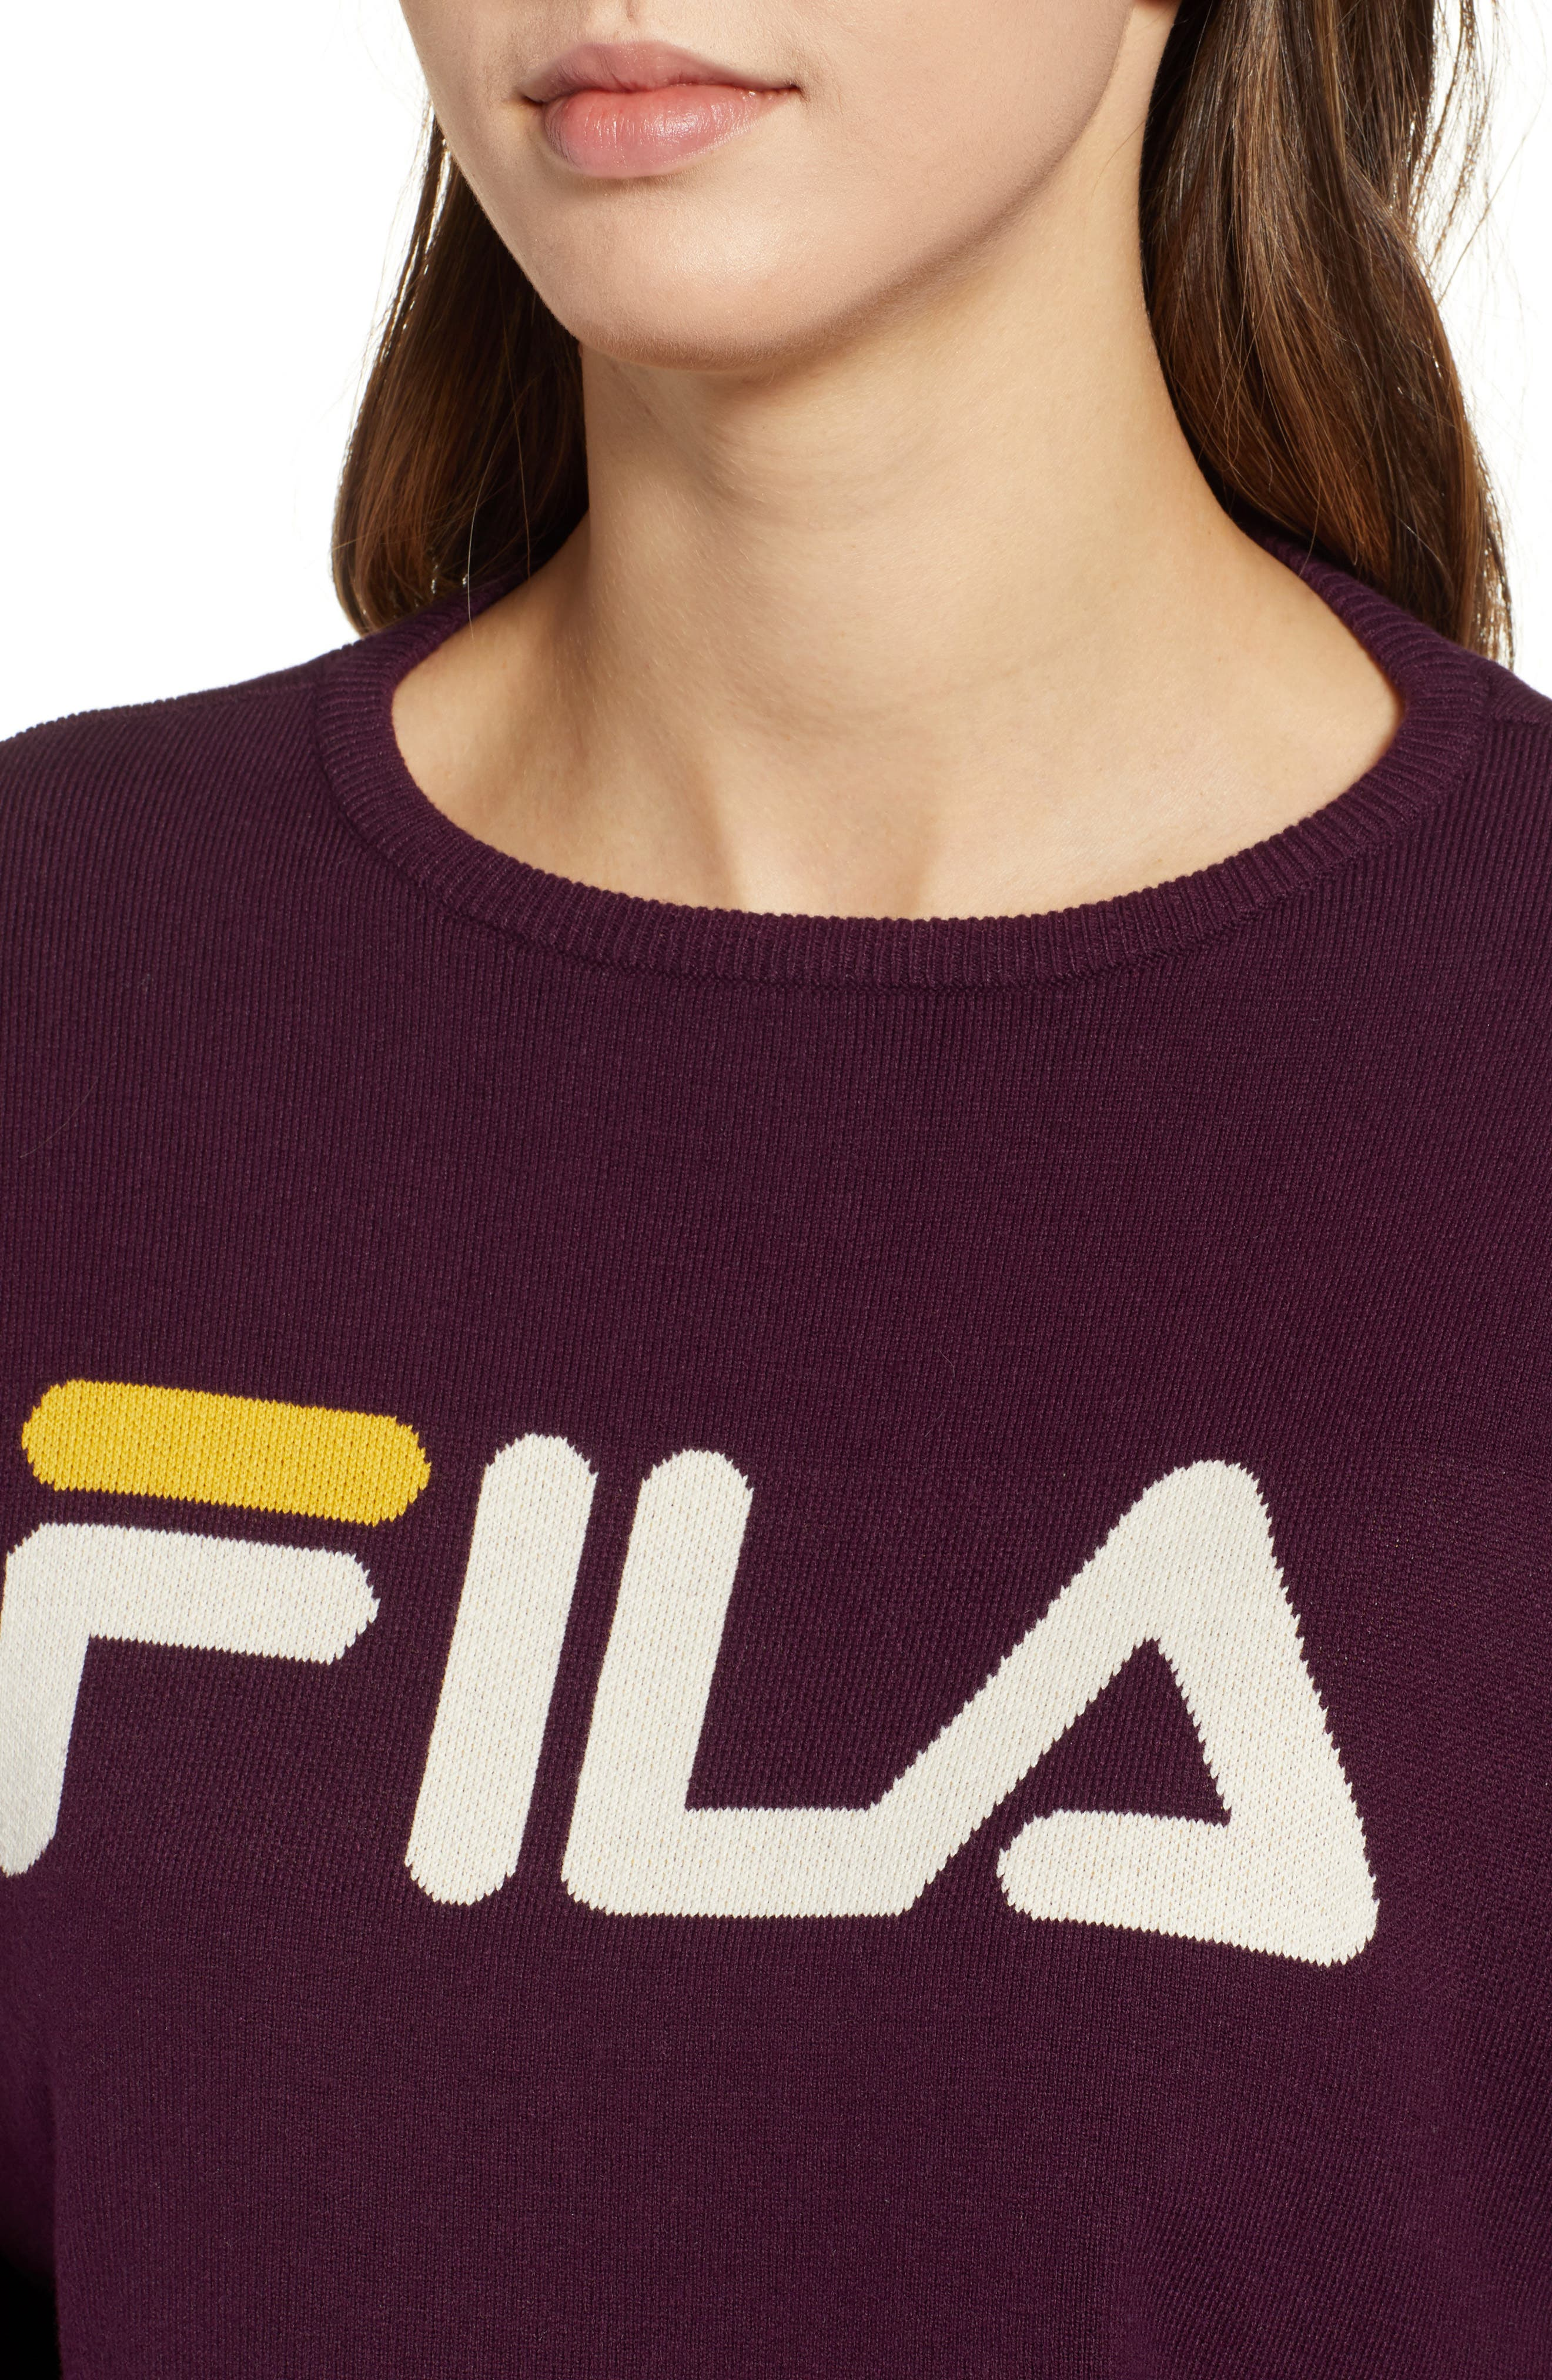 FILA, Palmira Crop Sweater, Alternate thumbnail 5, color, POTENT PURPLE